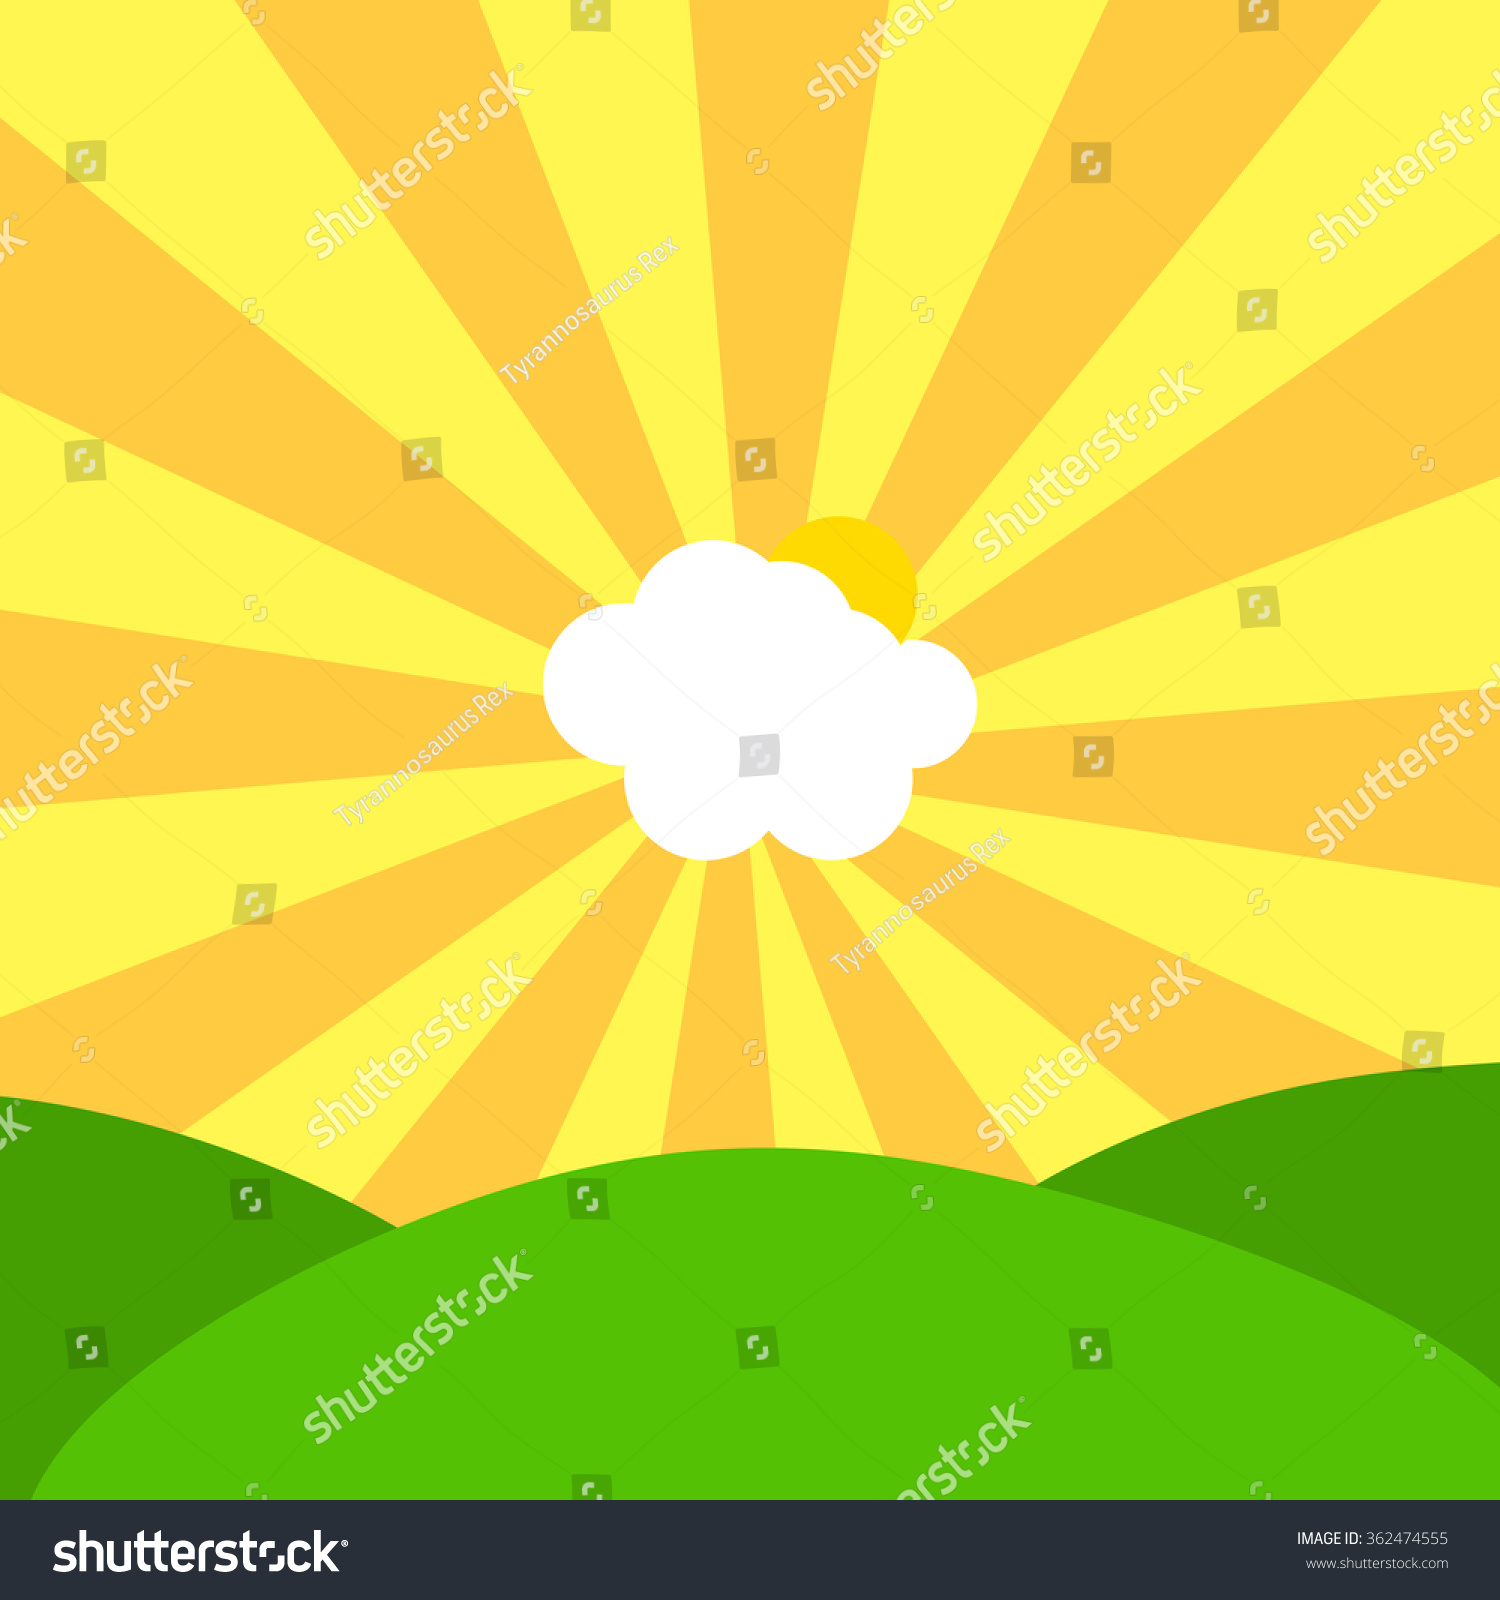 Abstract Illustration Cloud Sun Centre Yellow Stock Illustration ...